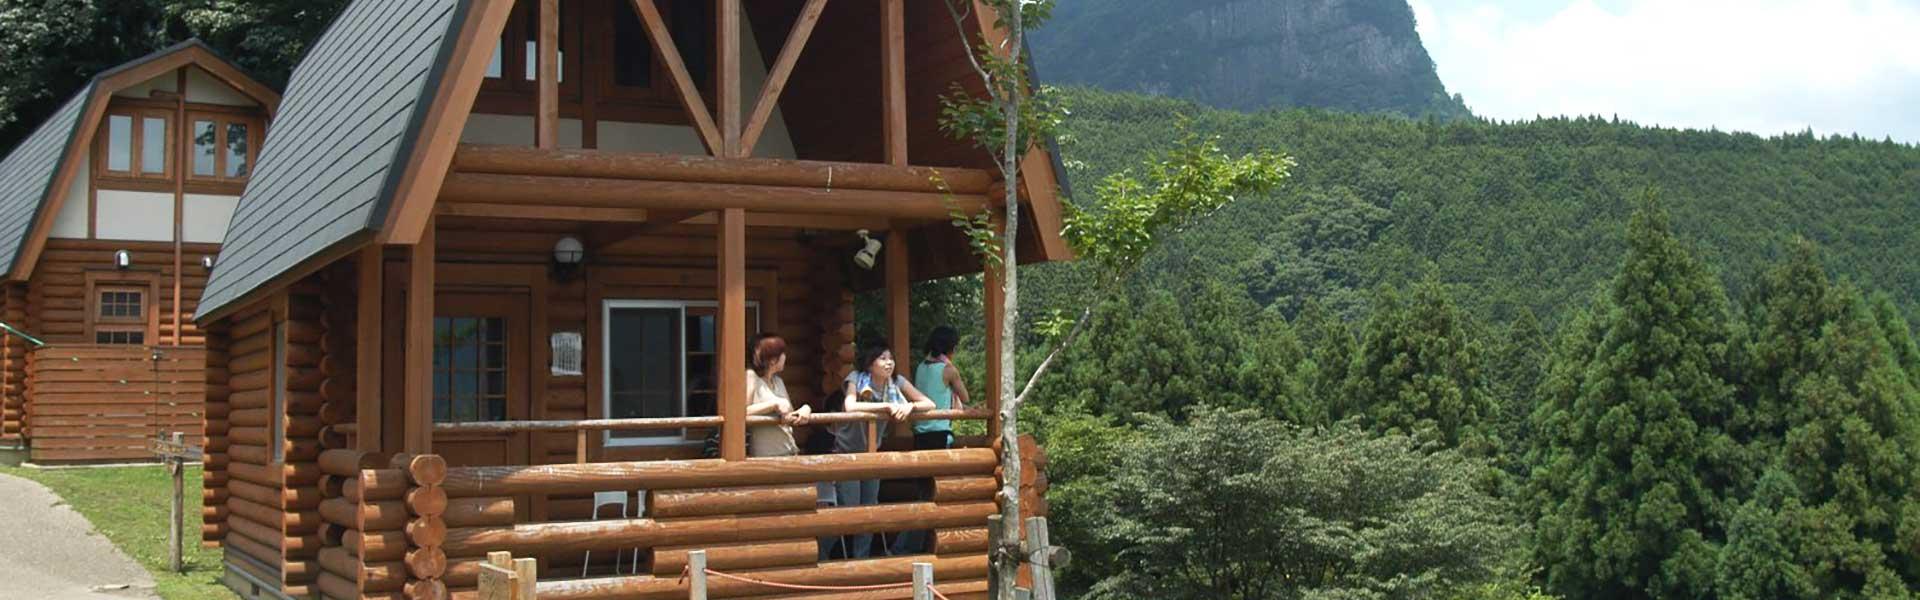 Summer Camping Getaways